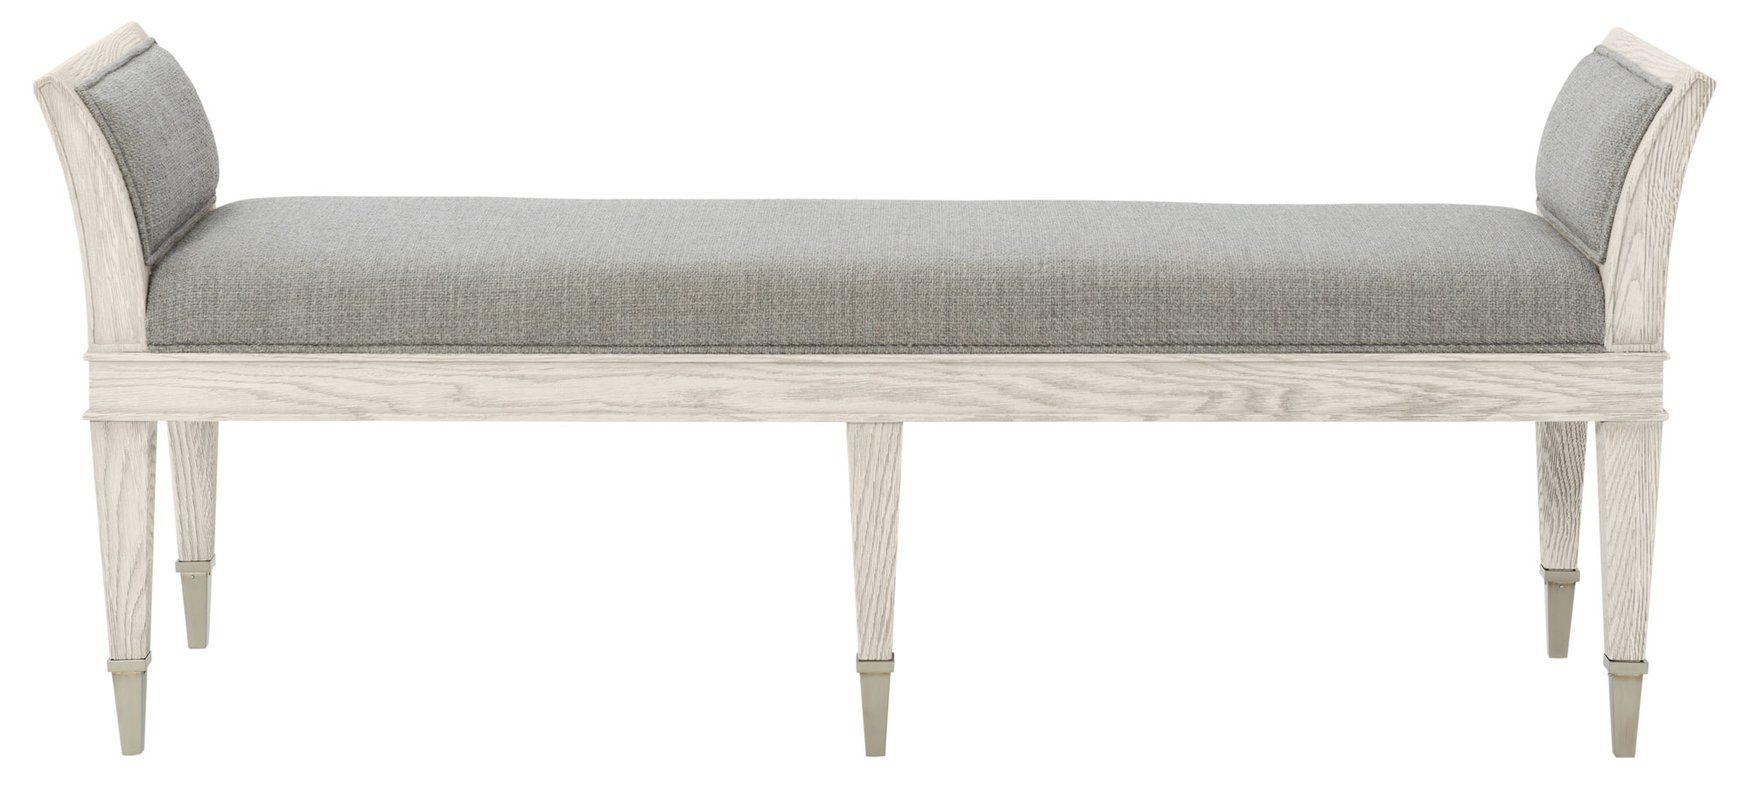 Domaine Upholstered Bench Living Room Bench Upholstered Bench Bedroom Bench #upholstered #bench #for #living #room